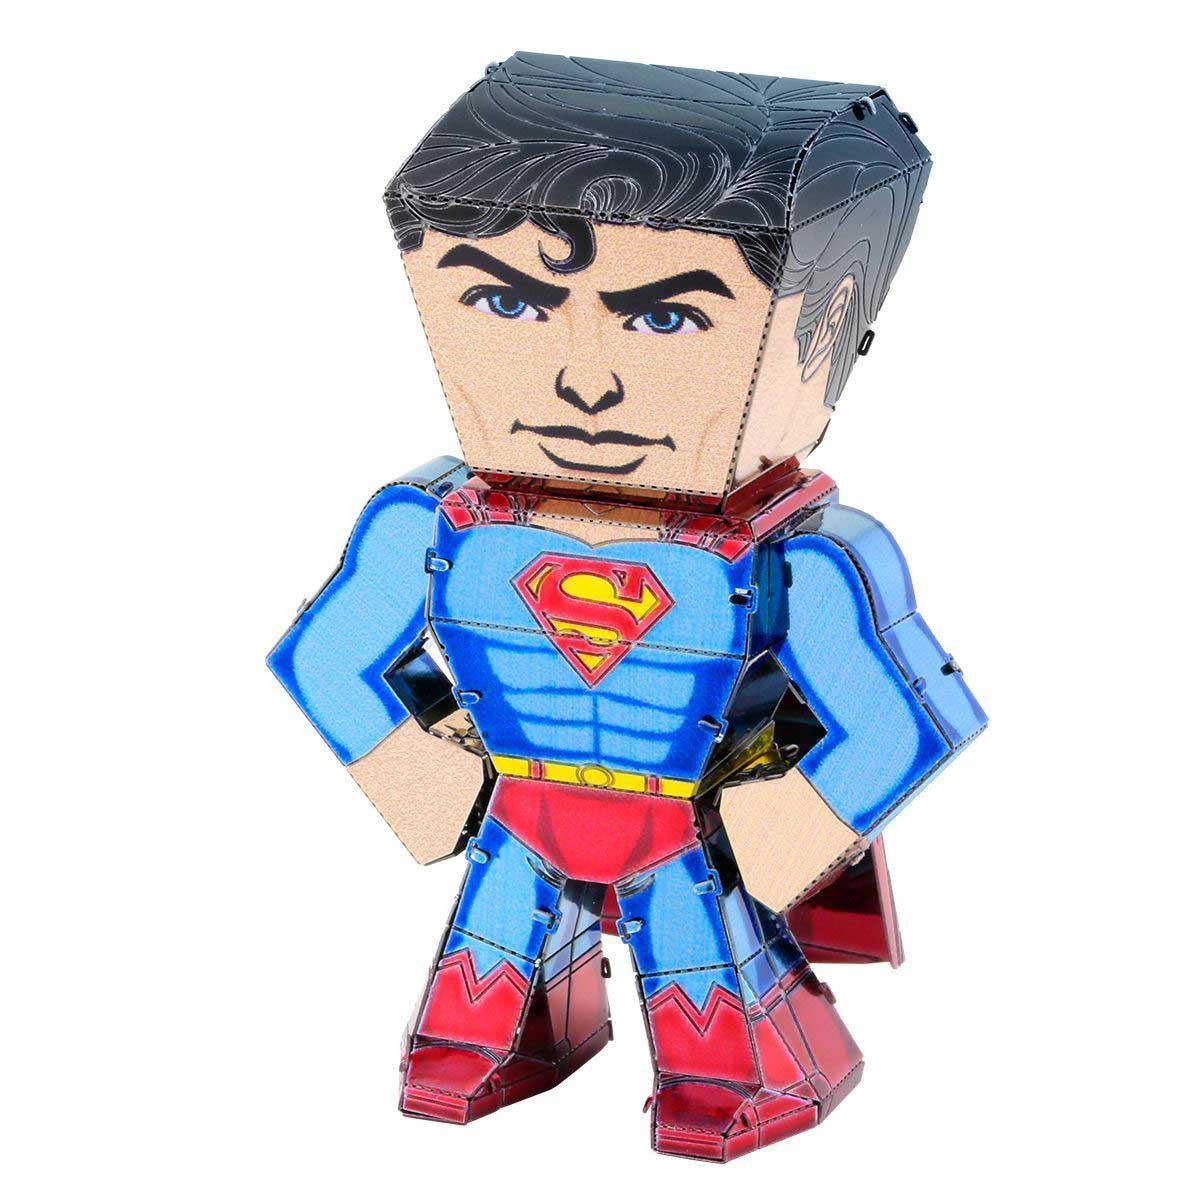 Superman Movies / Books / TV Metal Puzzles